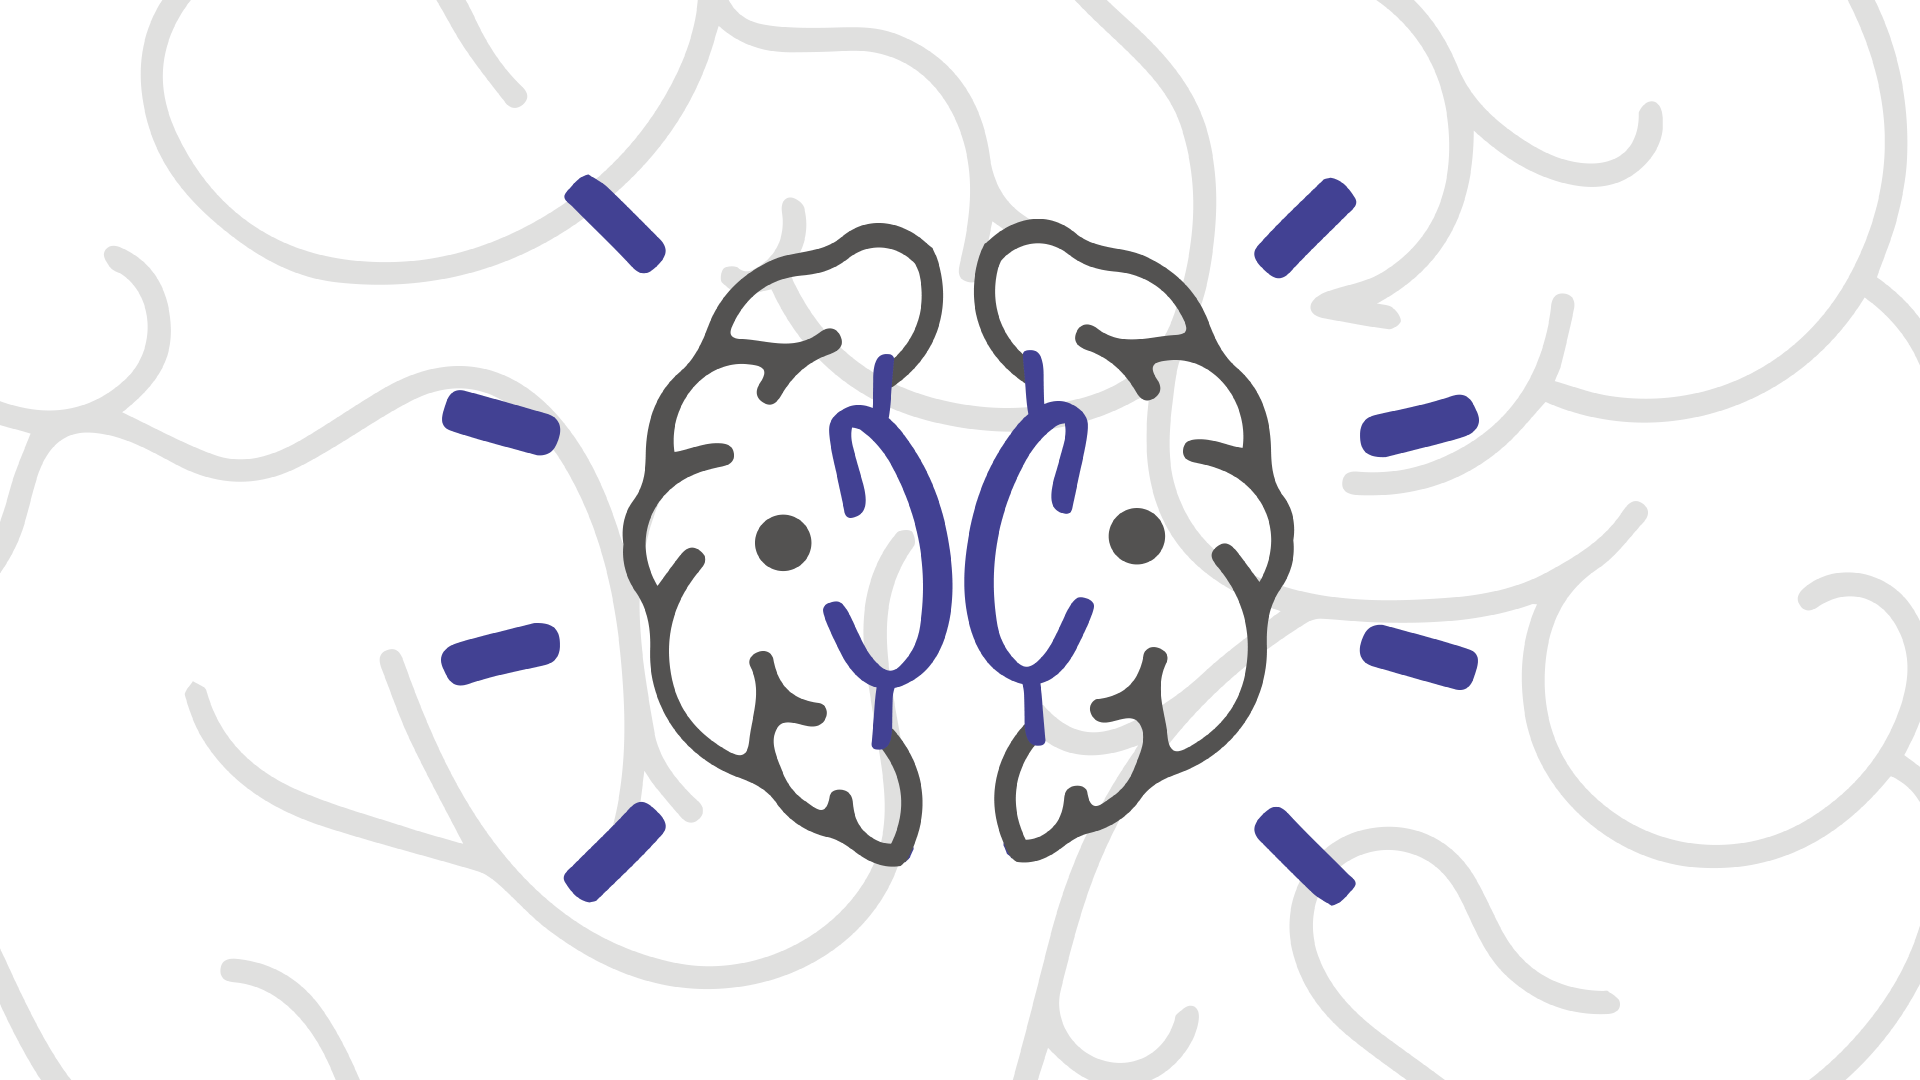 brain image over brain enlargement